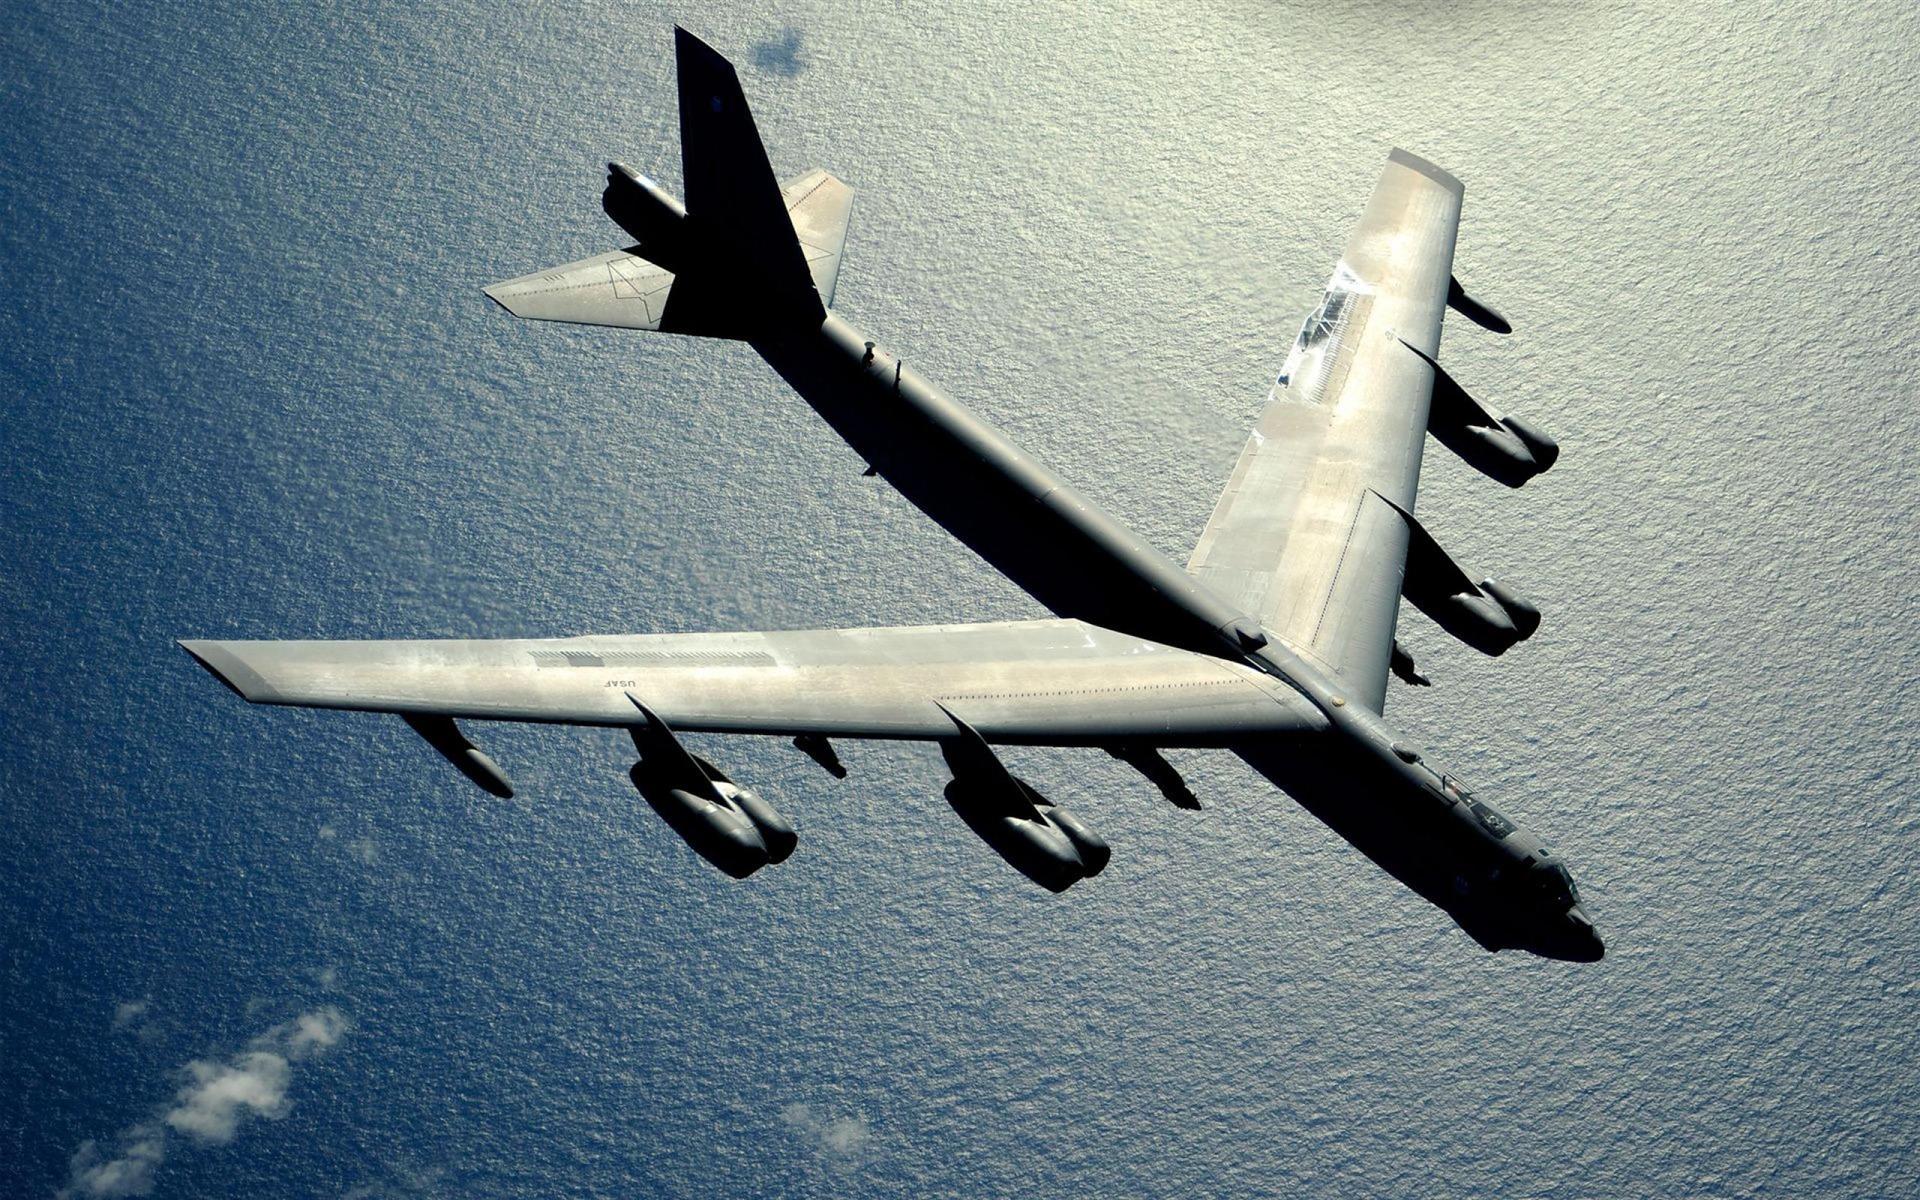 B 52 (航空機)の画像 p1_34